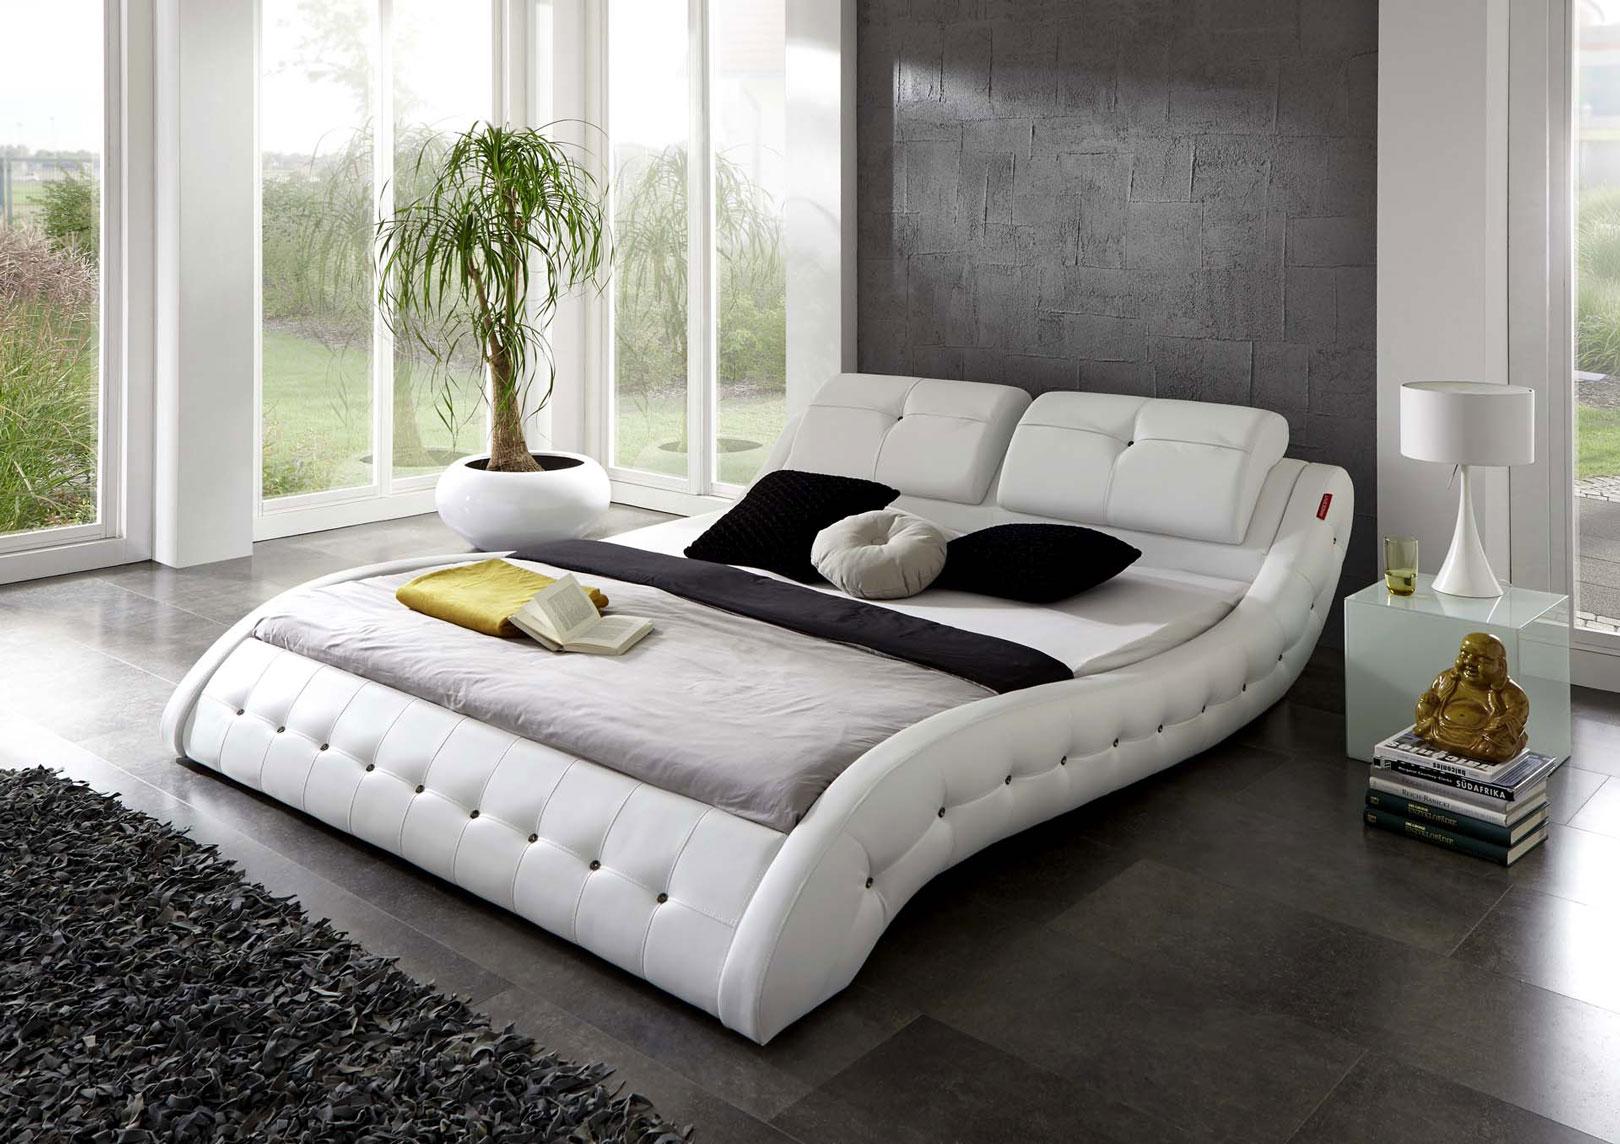 sam polsterbett 140 x 200 cm innocent mood farbauswahl. Black Bedroom Furniture Sets. Home Design Ideas